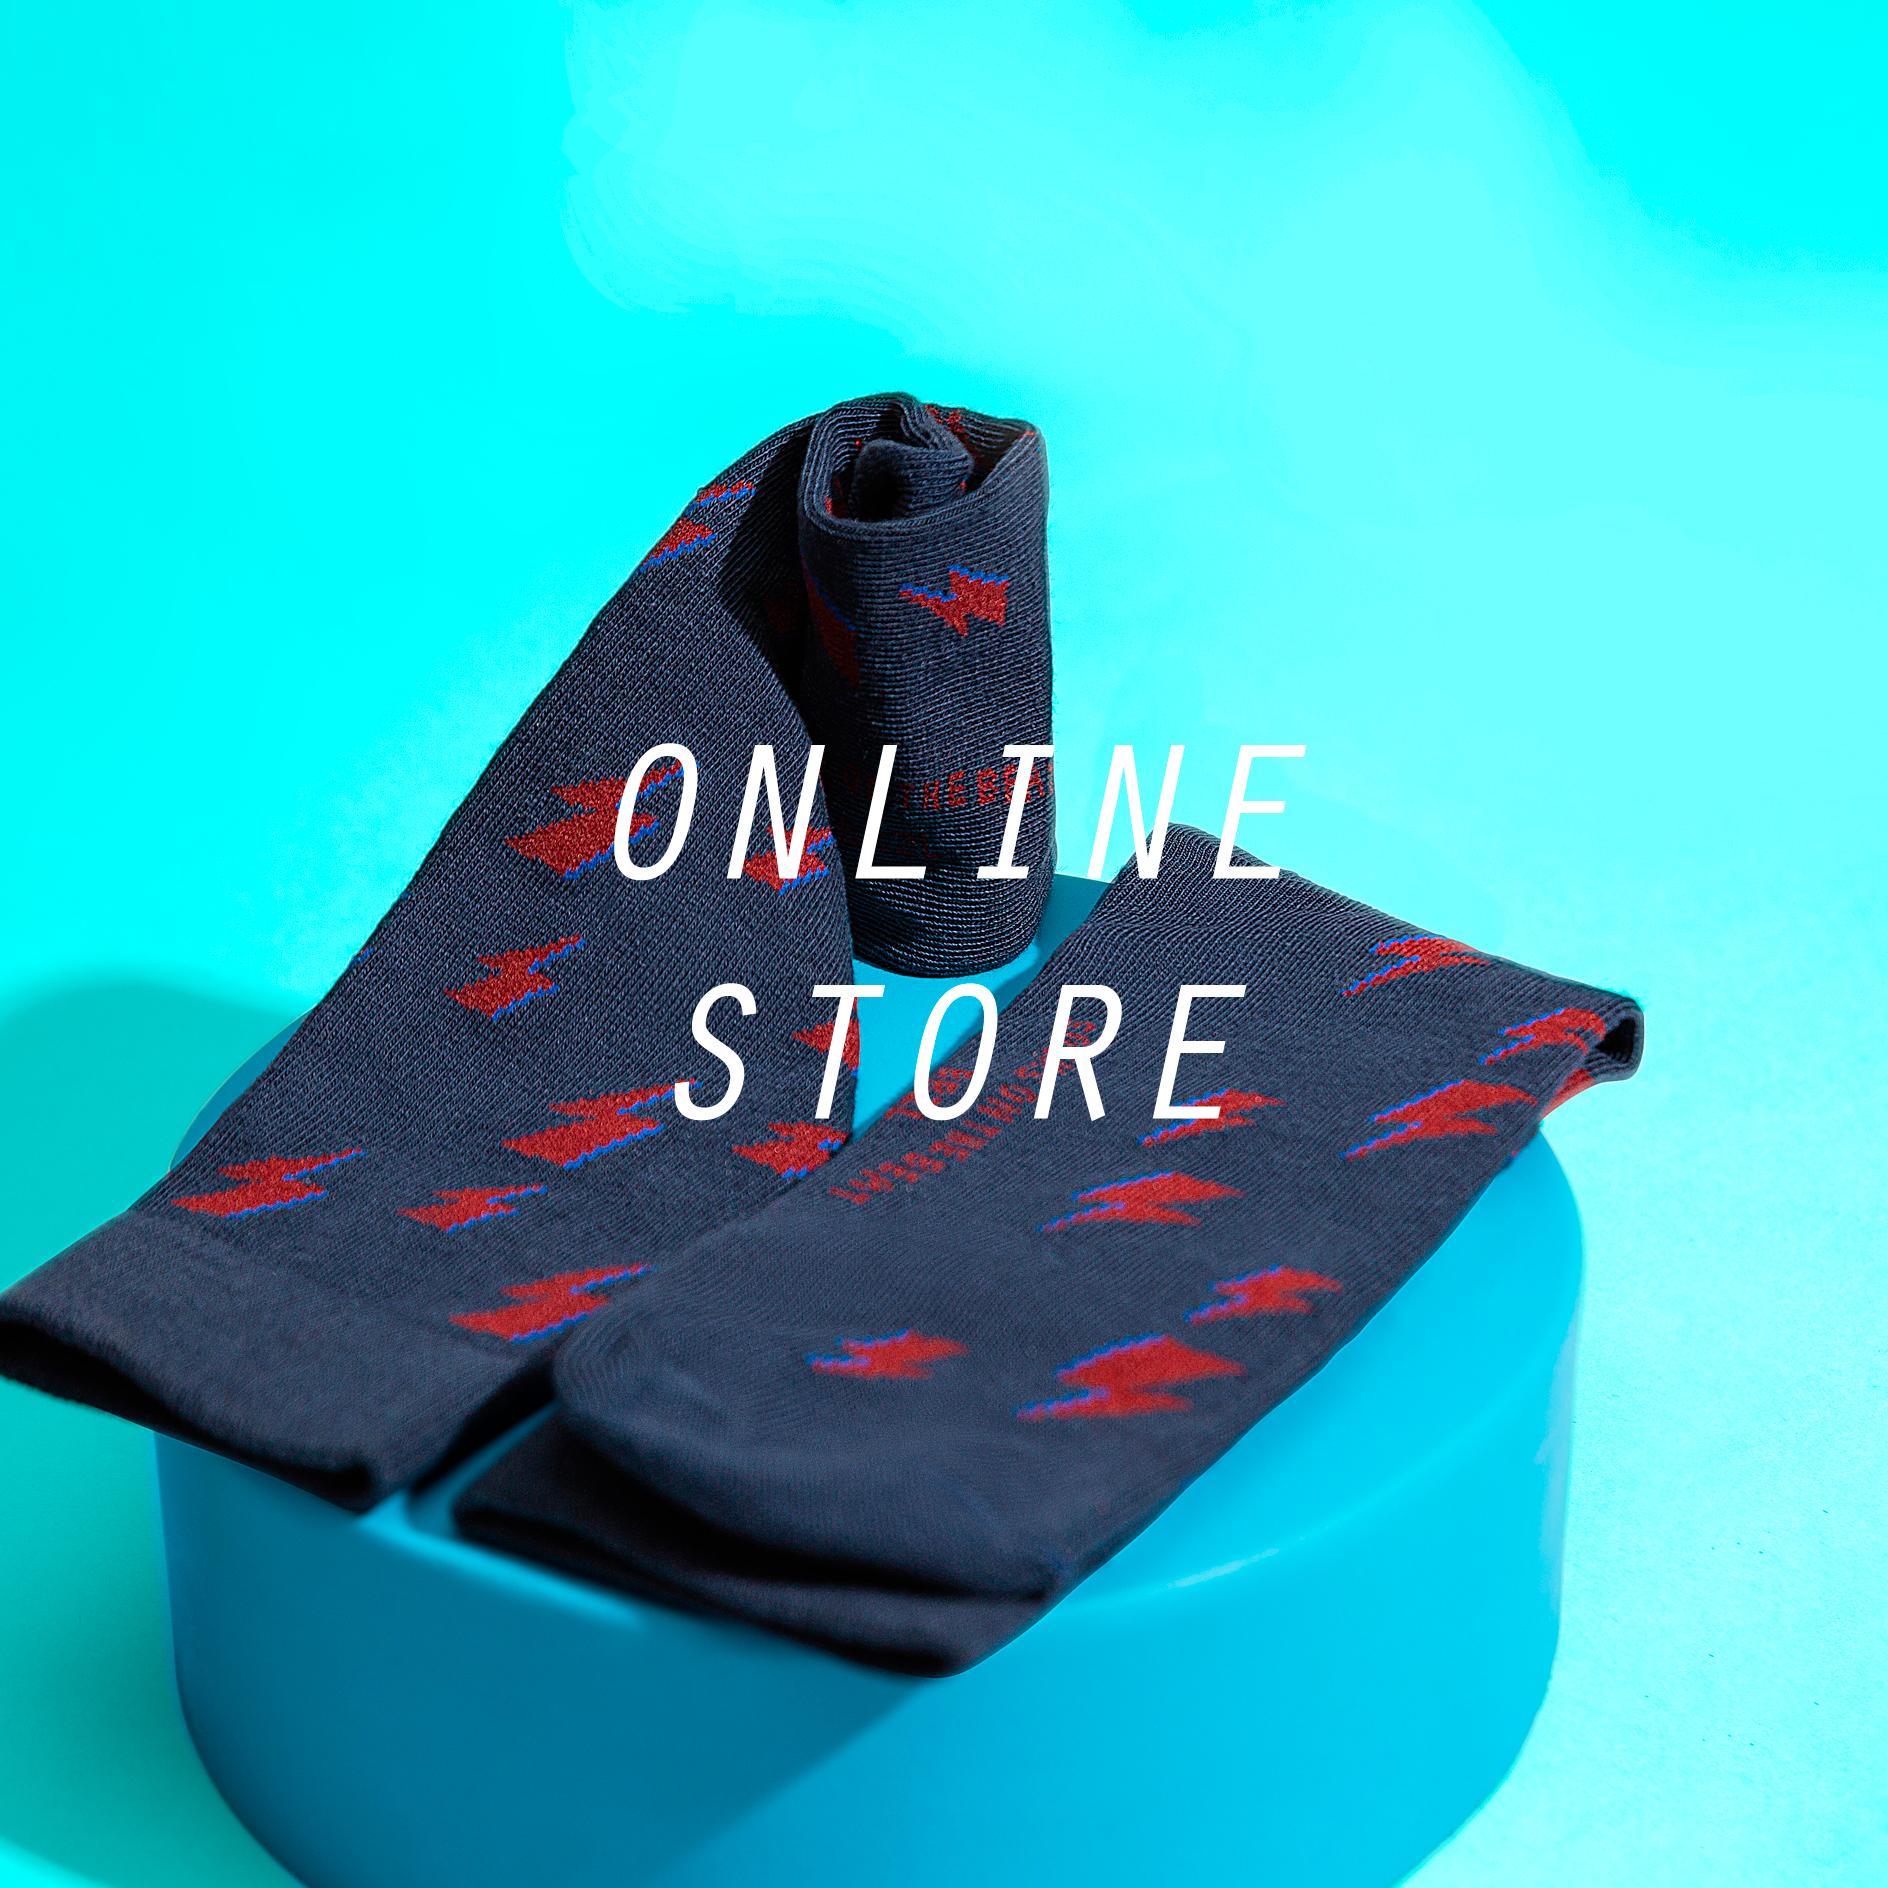 sotb_ecommerce-socks-on-the-beat